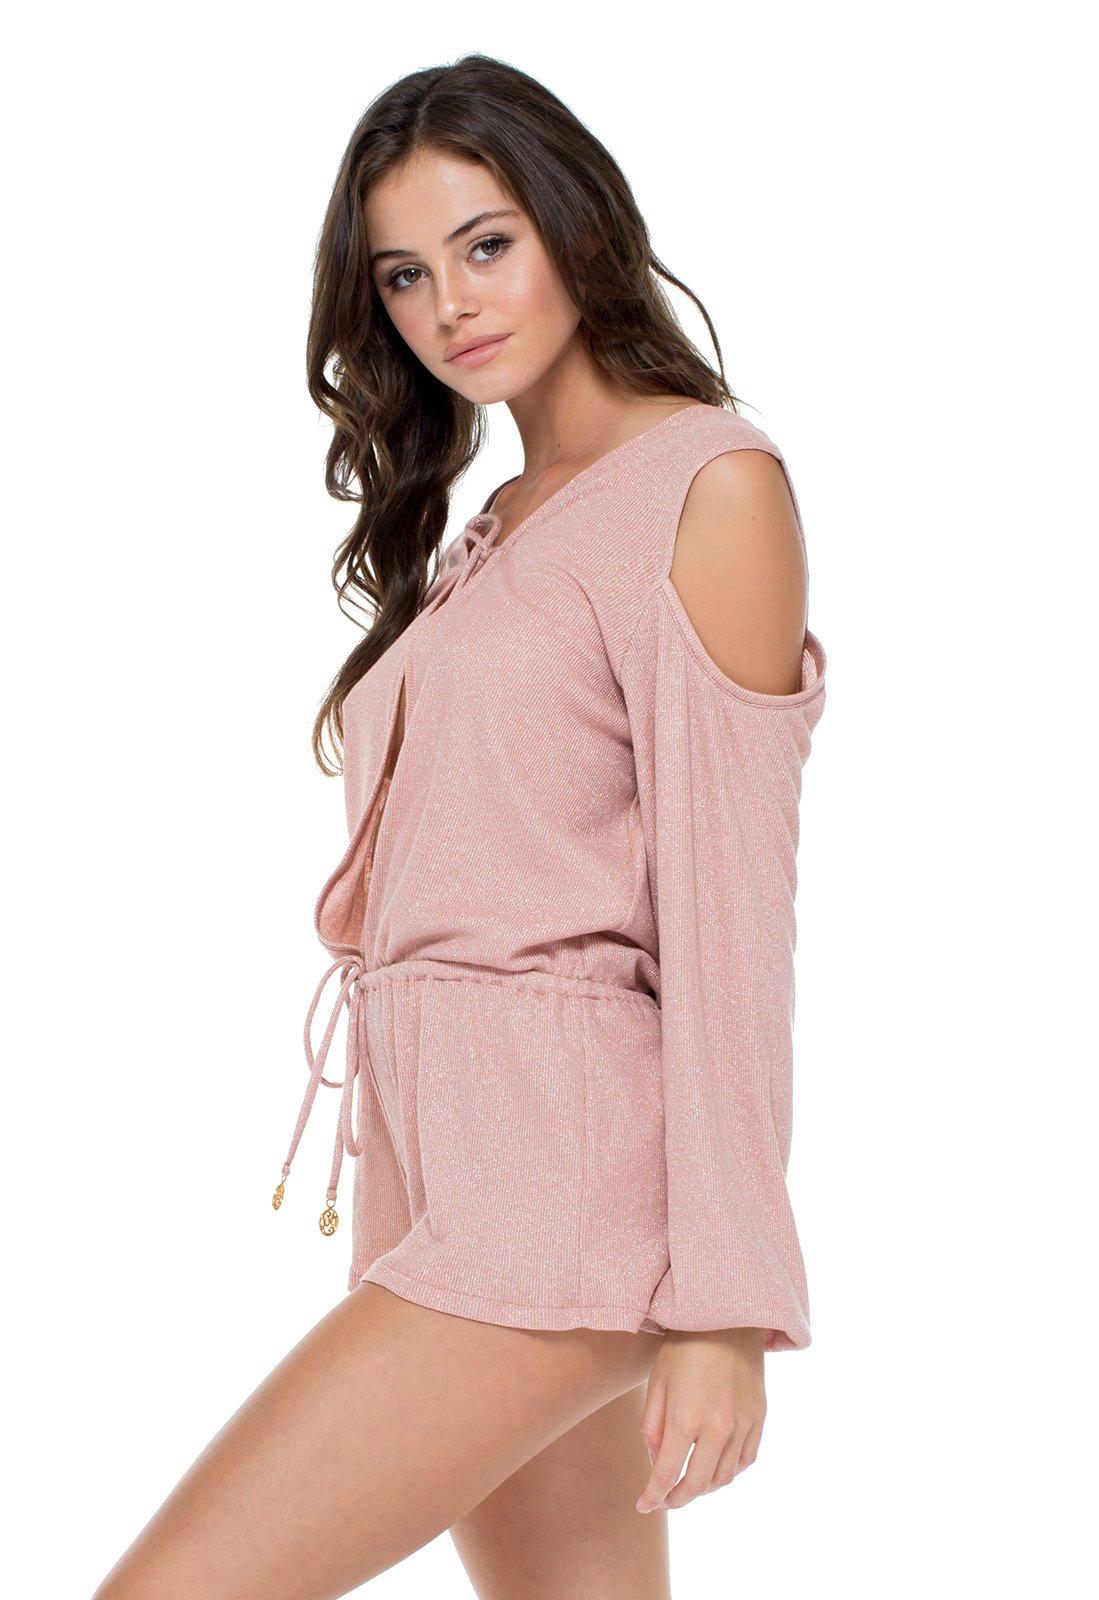 4a890e8f9e85 Sparkling Pink Long-sleeved Romper - Sabor Longsleeve Romper - Luli Fama